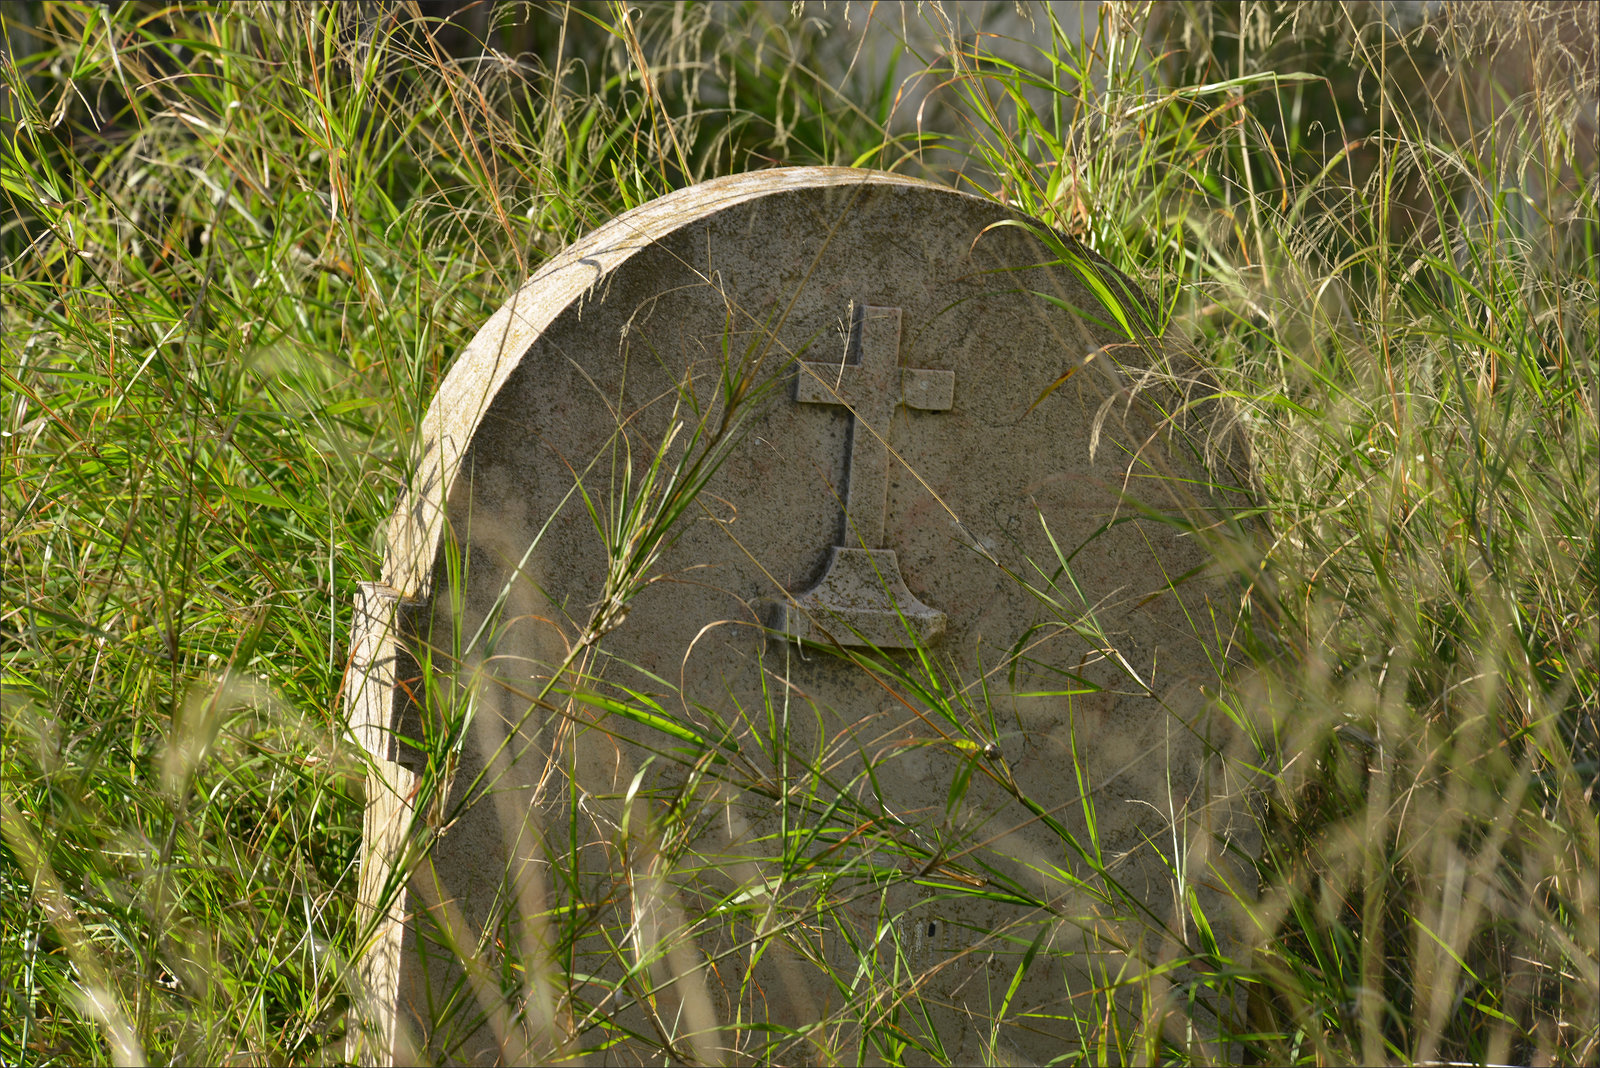 Minas de S. Domingos, Cemitério dos Ingleses..